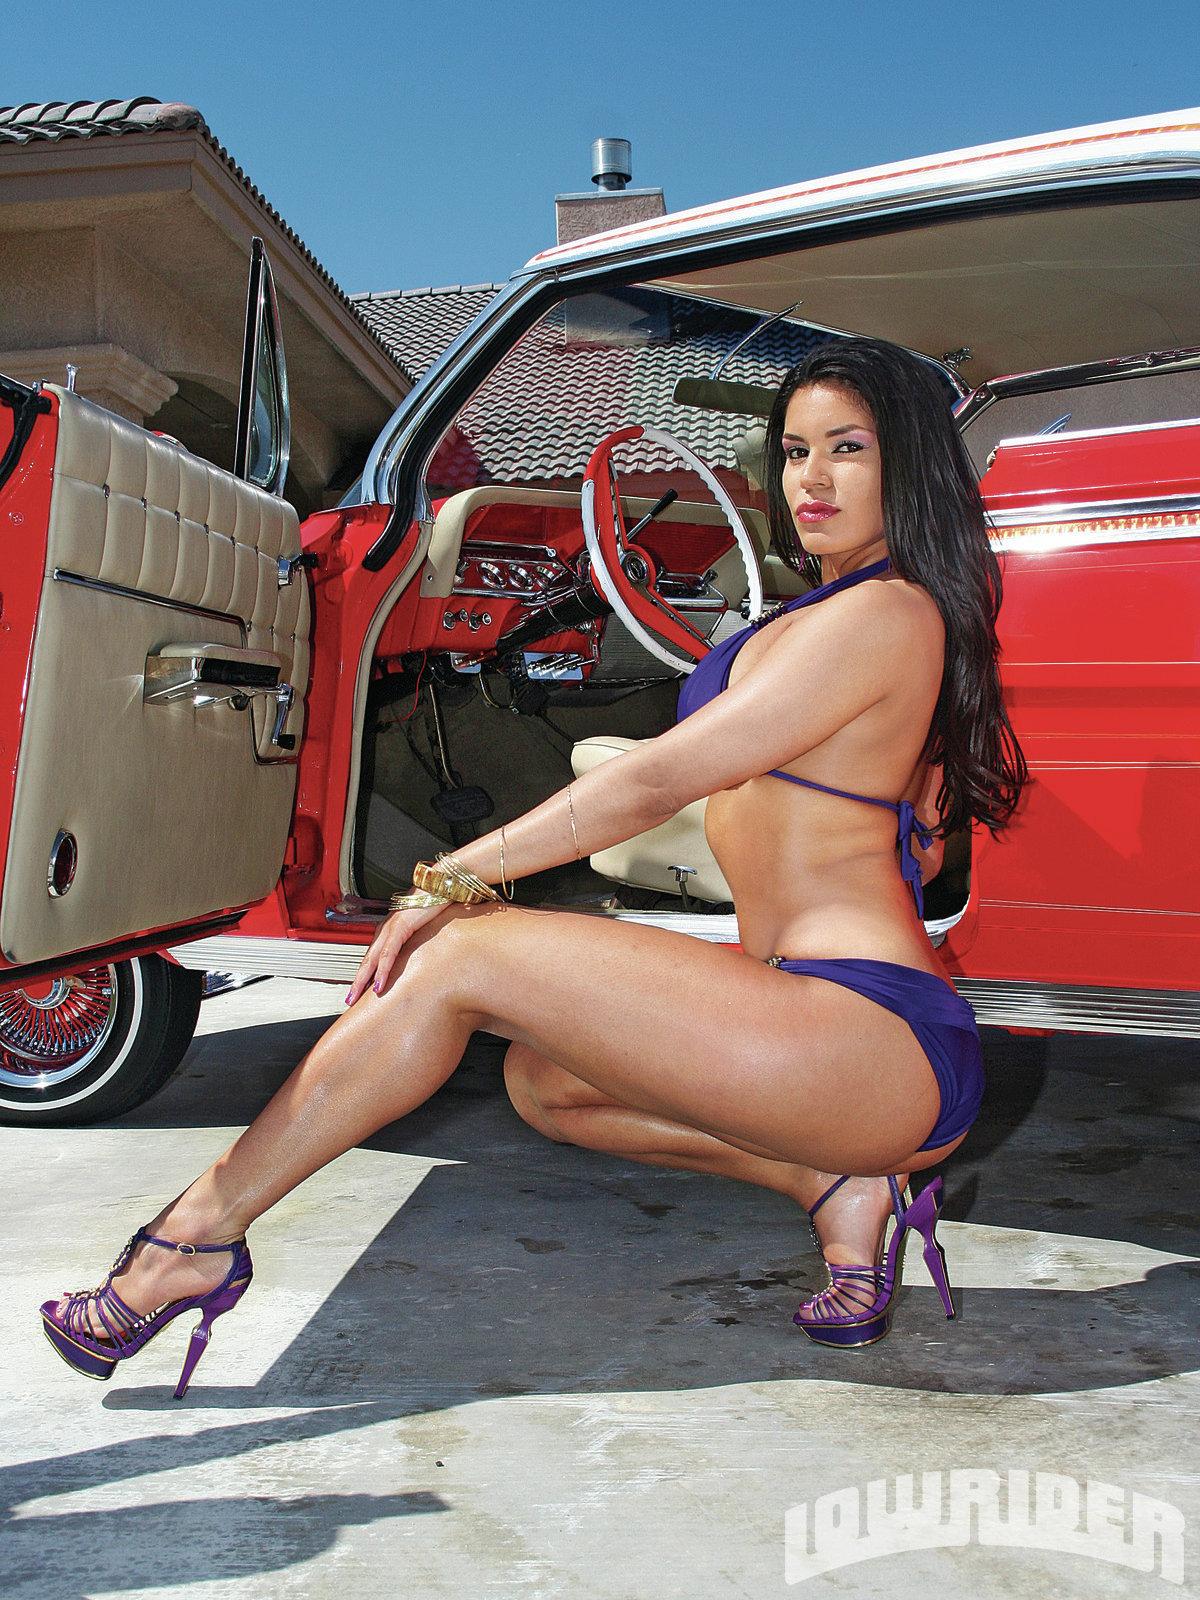 Gmc Las Vegas >> Beauties on the Block - November 2011 - Lowrider Girls